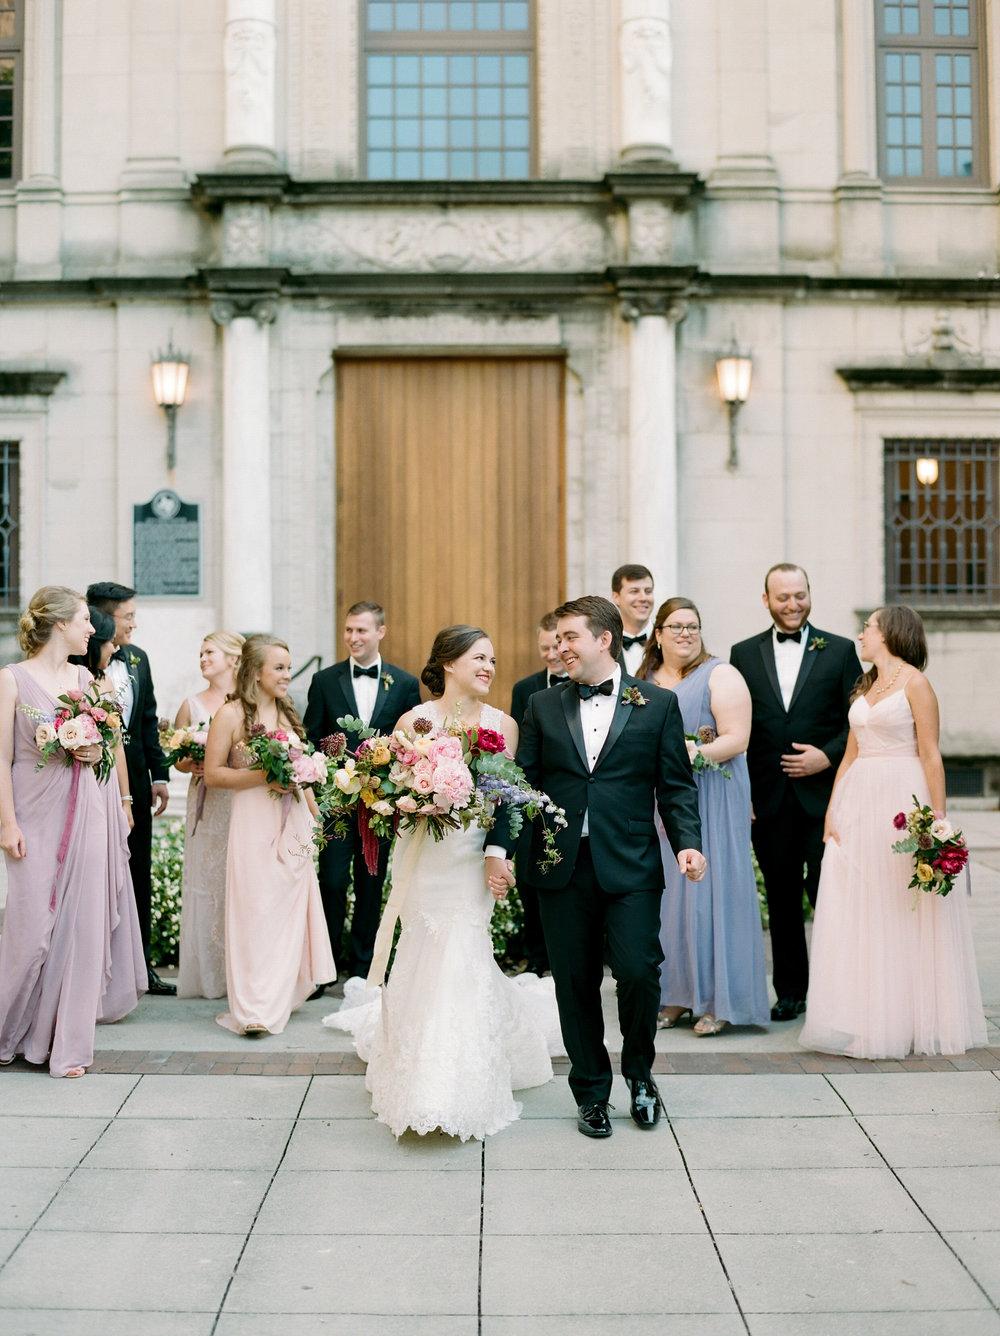 The-Knot-Texas-Fine-Art-Wedding-Film-Destination-Photographer-Houston-Austin-Dallas-New-Orleans-Julia-Ideson-Library-Event-Dana-Josh-Fernandez-Photograph-Top-Best-39.jpg